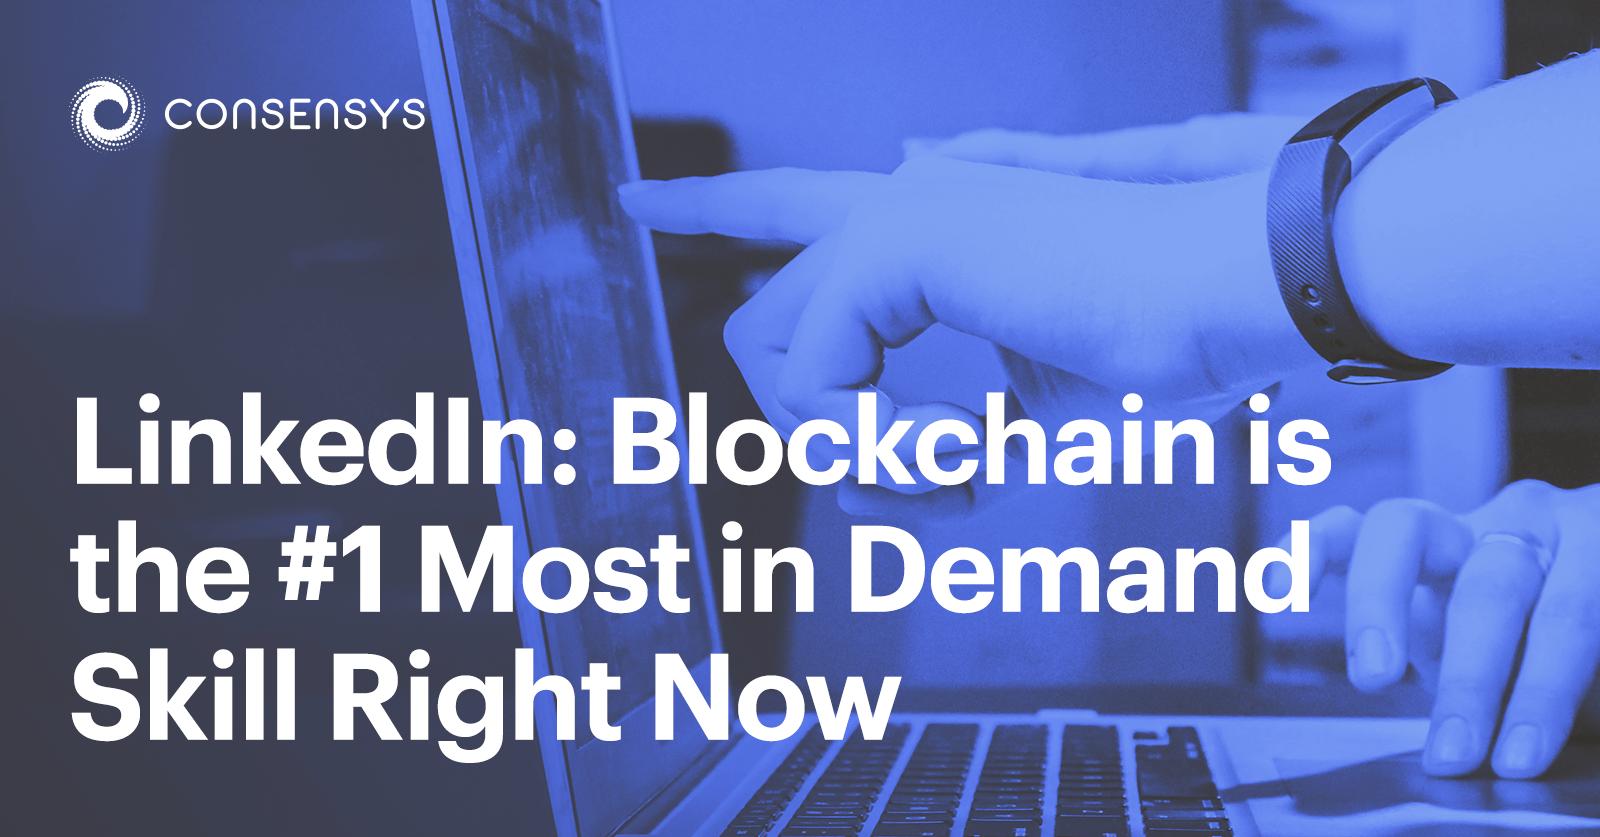 linkedin blockchain skill featured